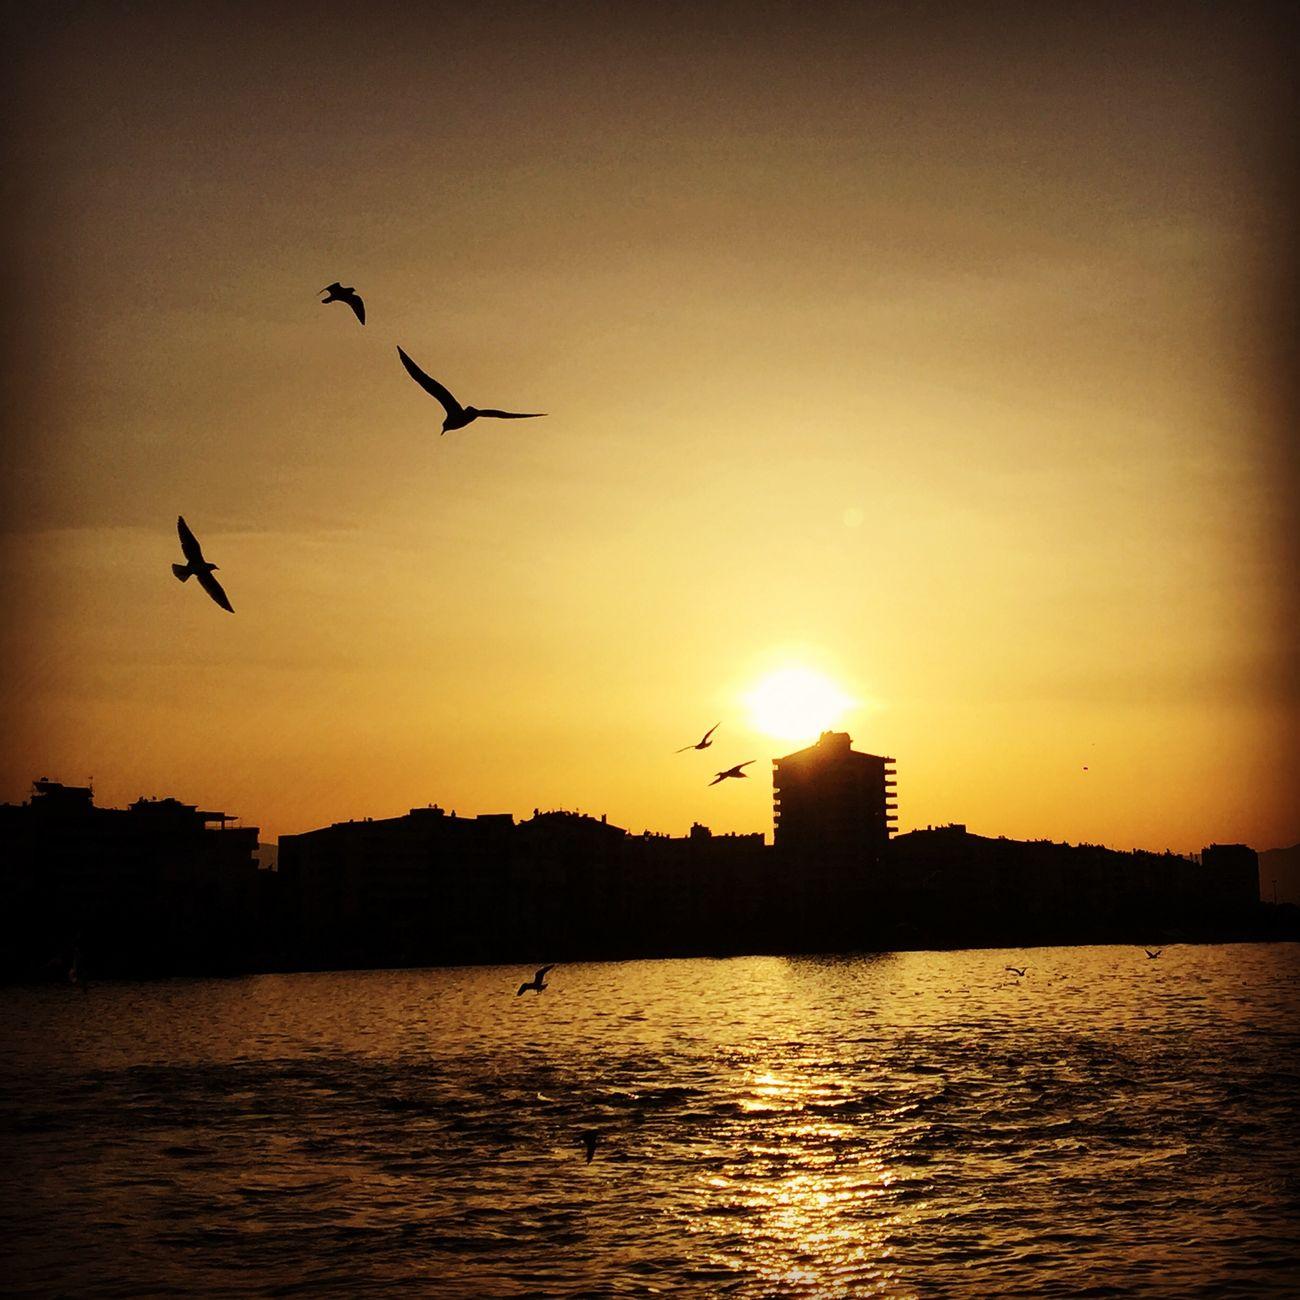 Bostanlı Karşıyaka Izmir Vapur Birds Sea Sea And Sky Morning Taking Photos Photography